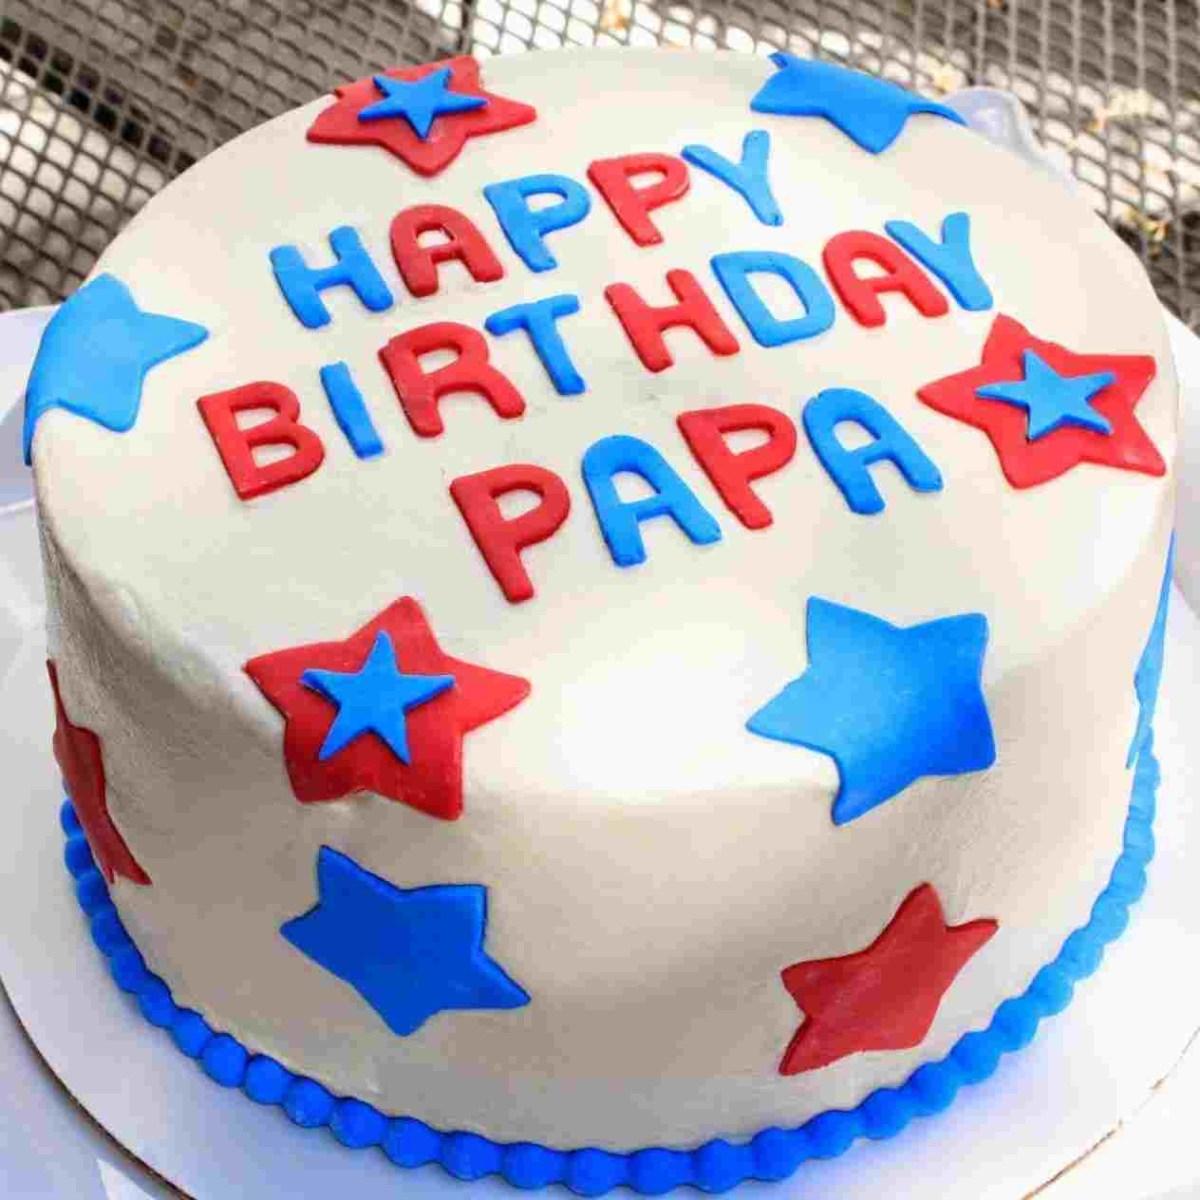 Happy Birthday Dad Cake Picture Recipes To Rhcom Tina Daddy